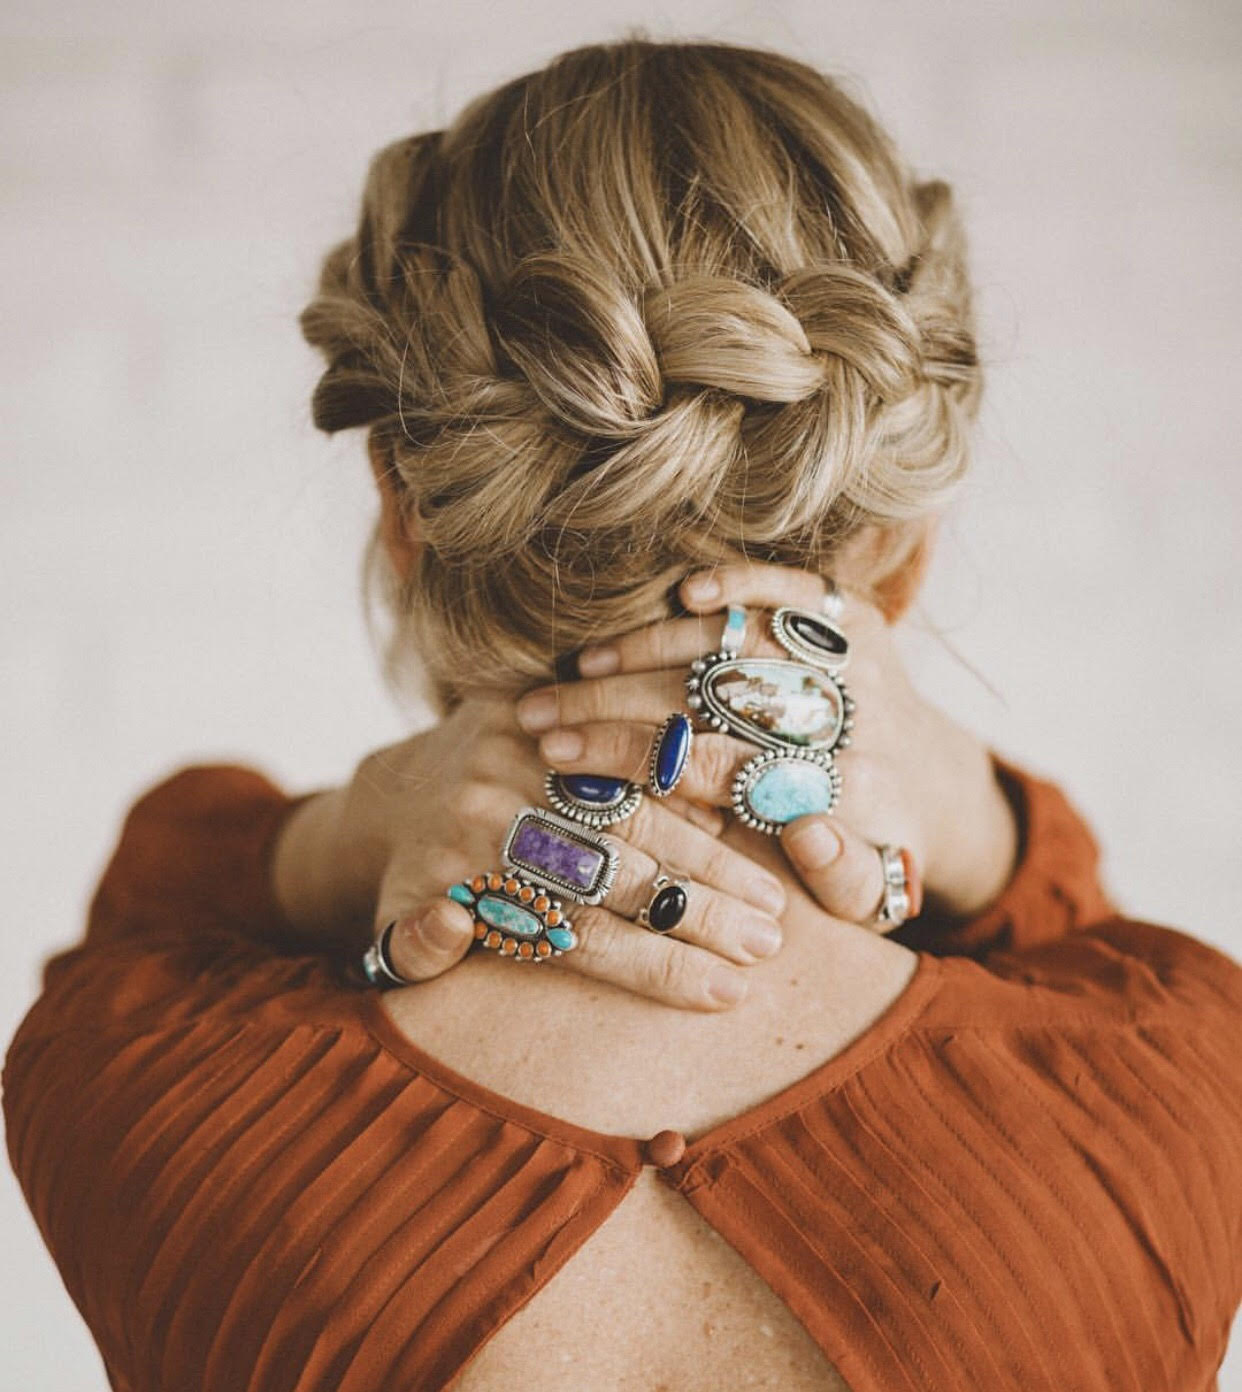 Southwest Silver Gallery  Photographer: Jessica Janae  Model: Hilary Hamilton  Hair Stylist: Abigail Hill